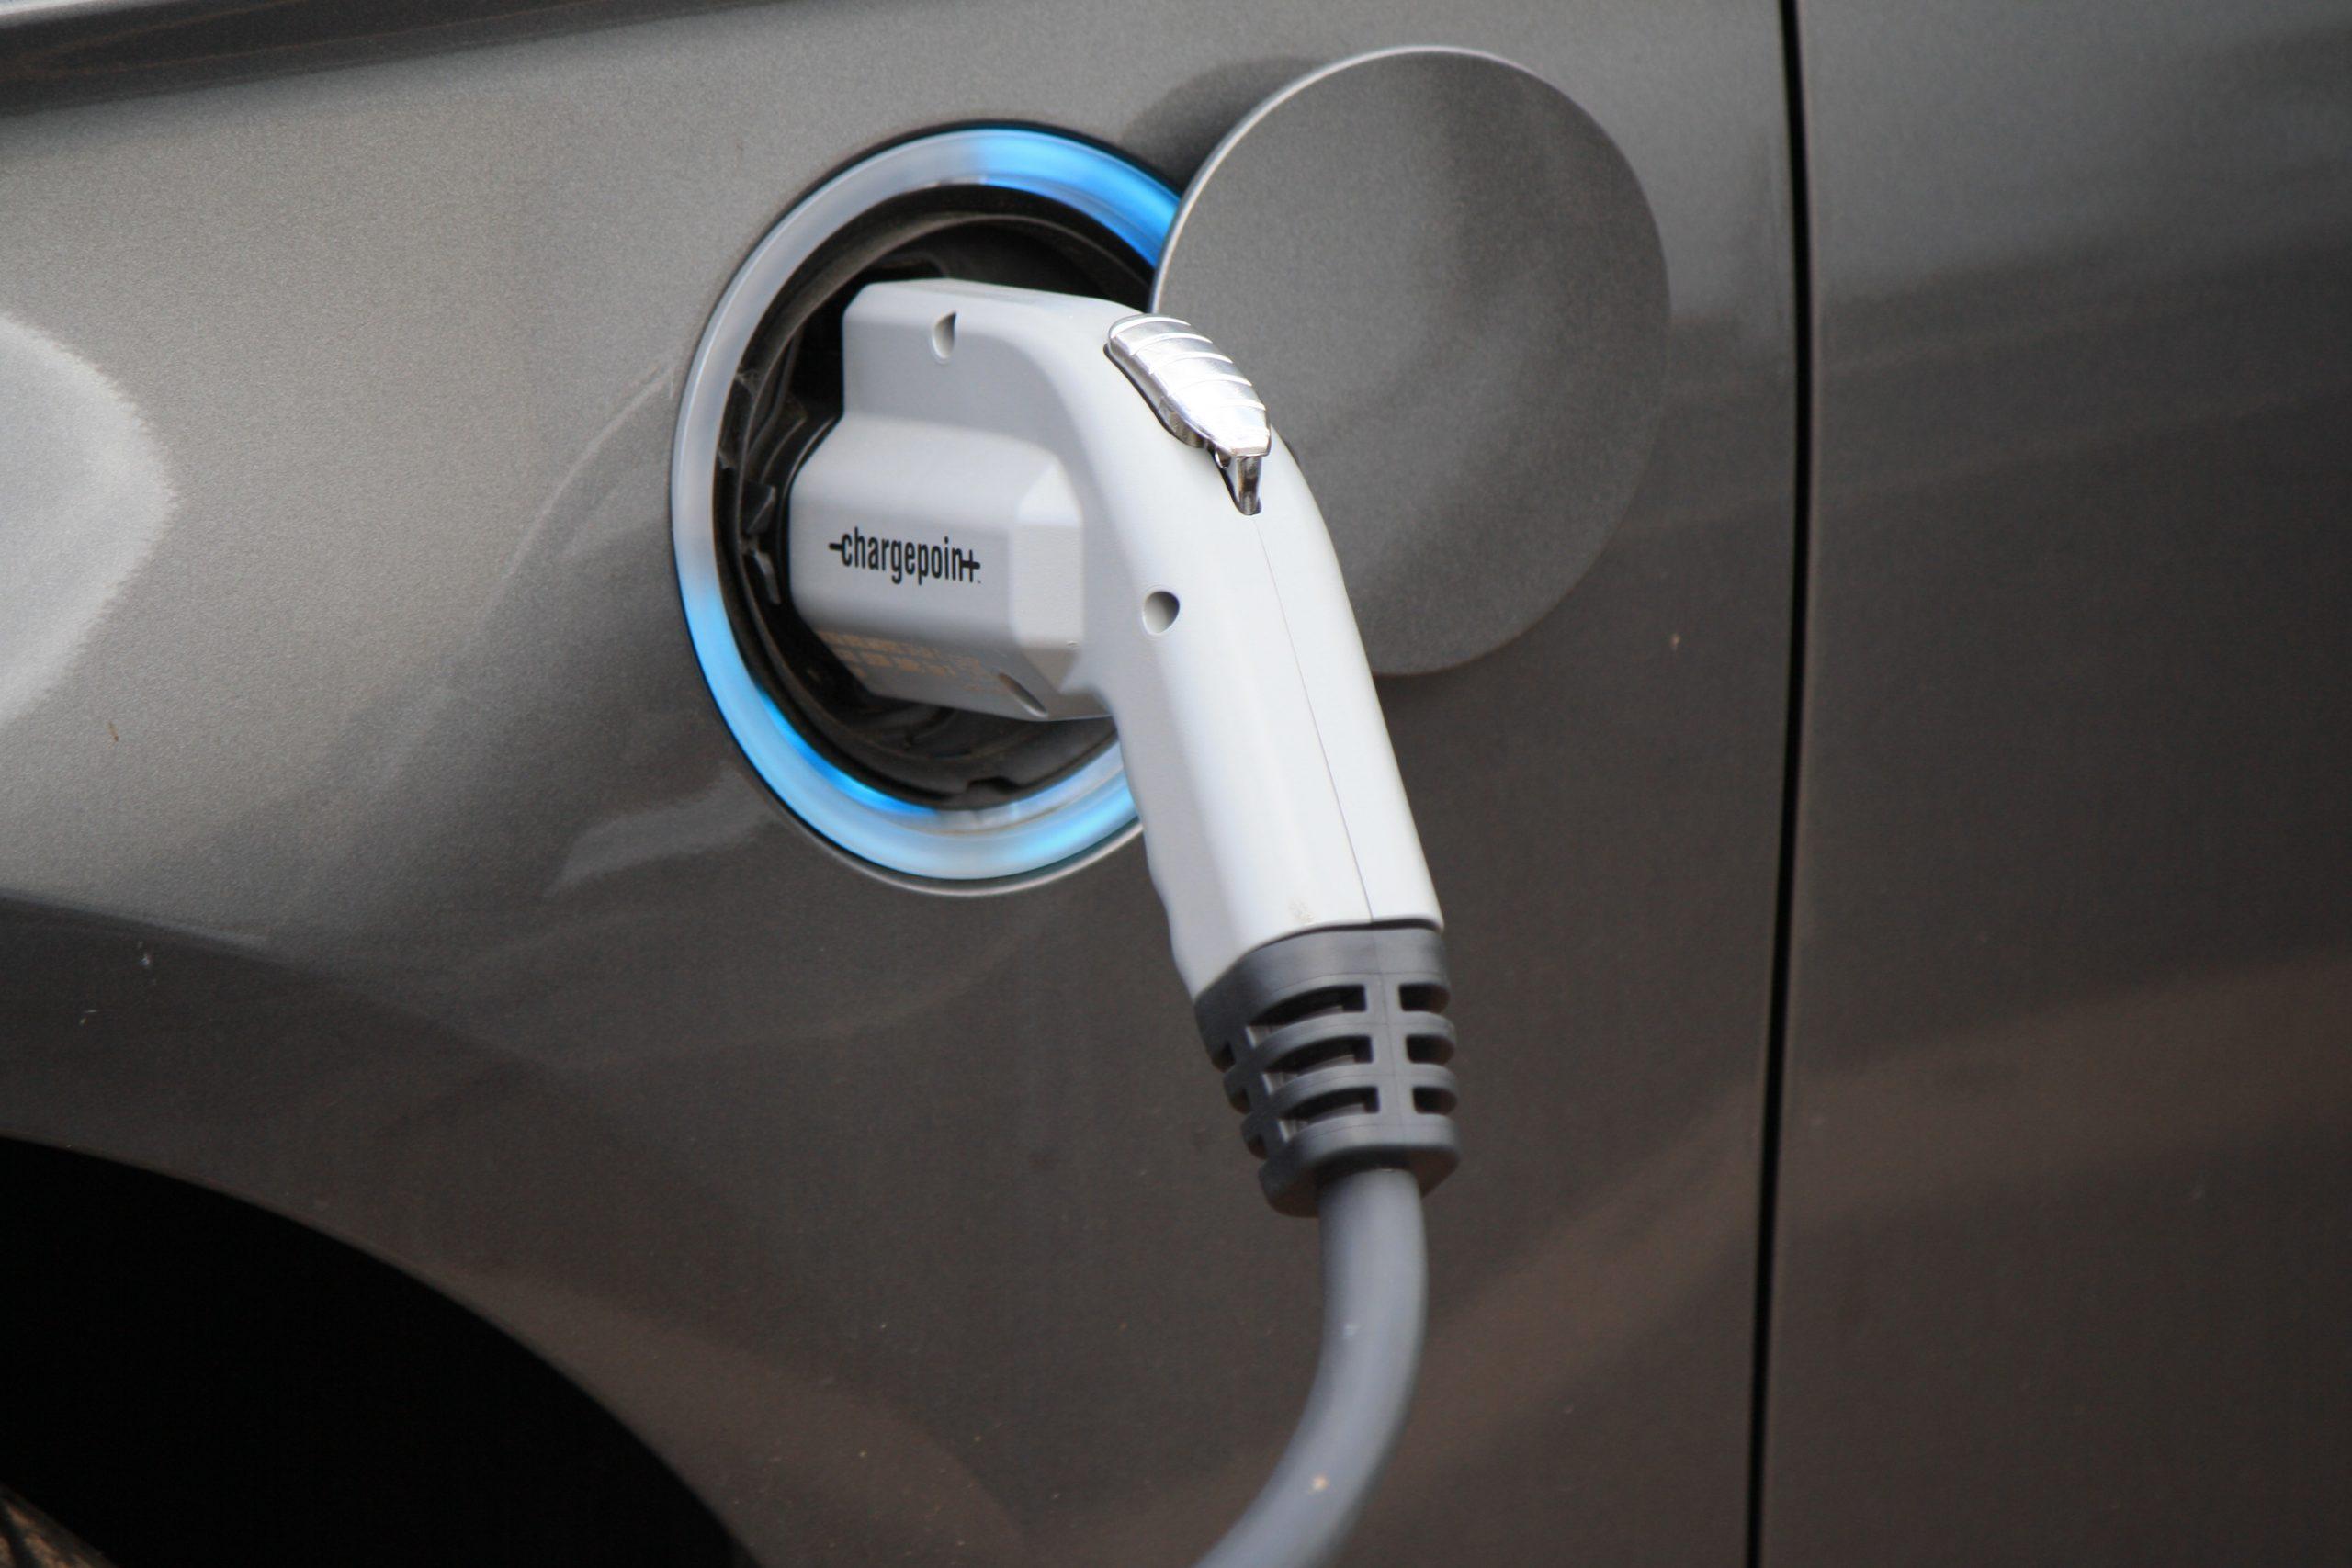 Electric vehicle / EV charging. (Credit: Noya Fields/ Flickr)